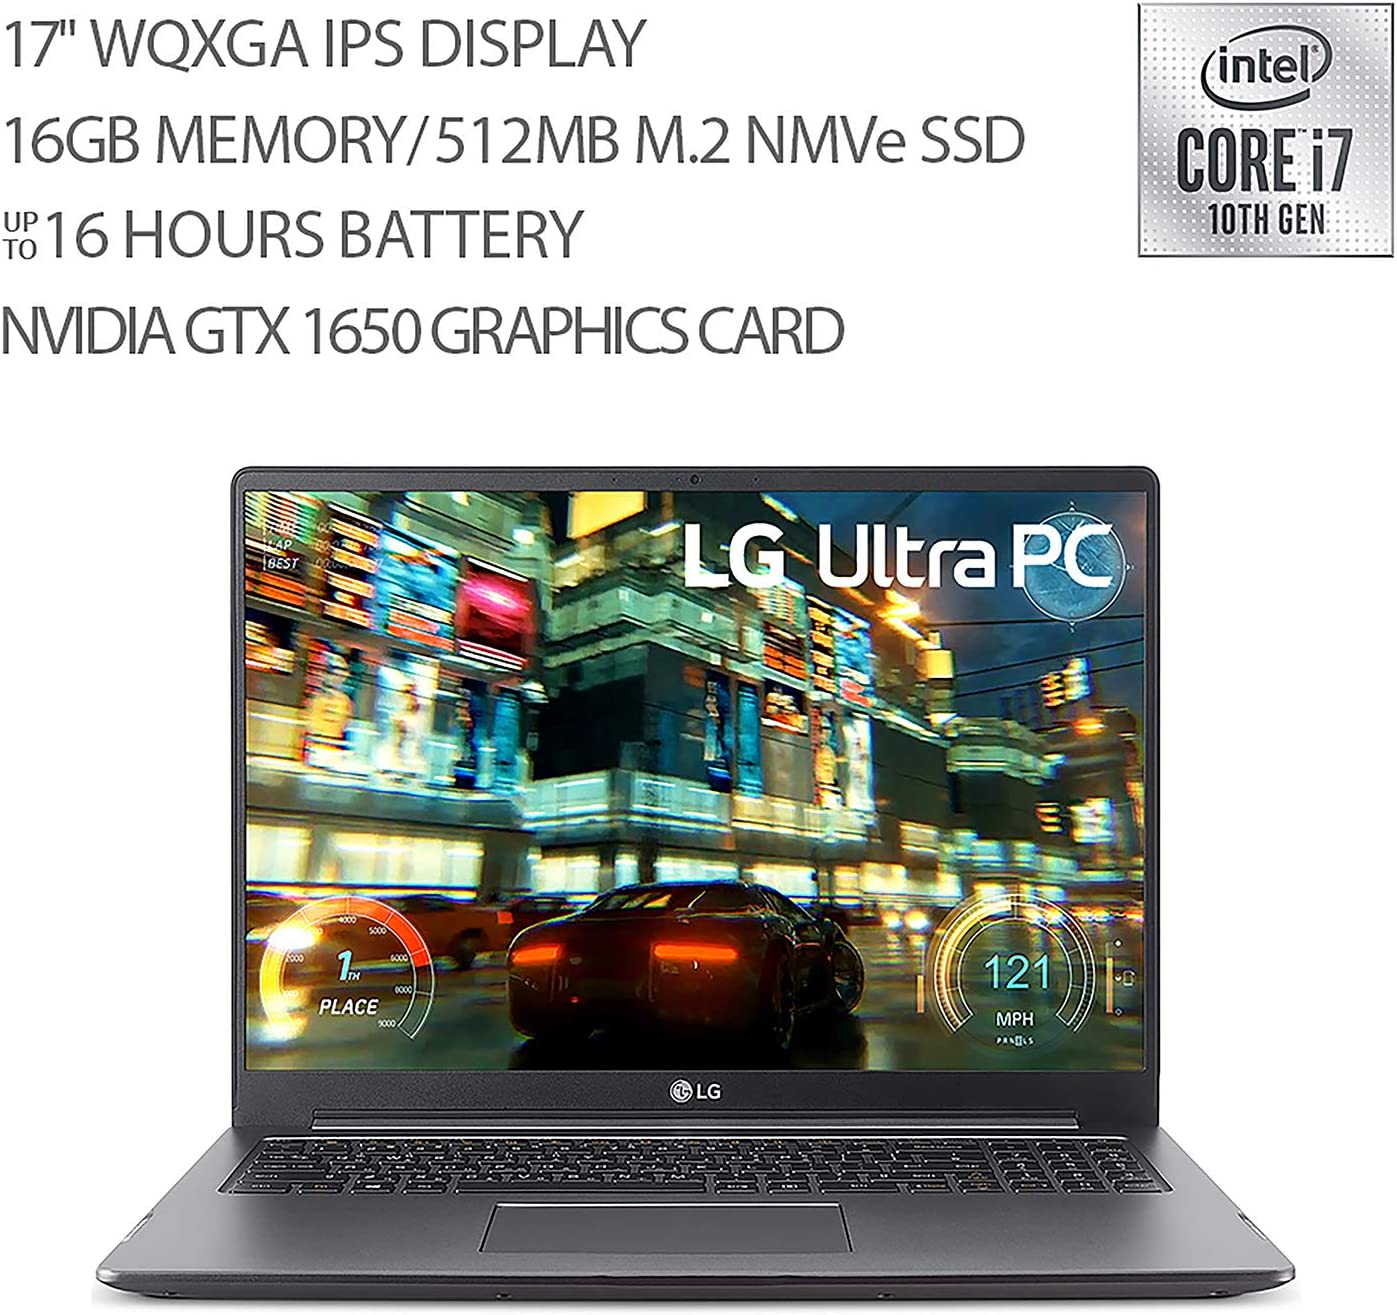 71HAc43l%2B3L. AC SL1500 Best Laptops for Seniors & Elderly for 2021 Reviews